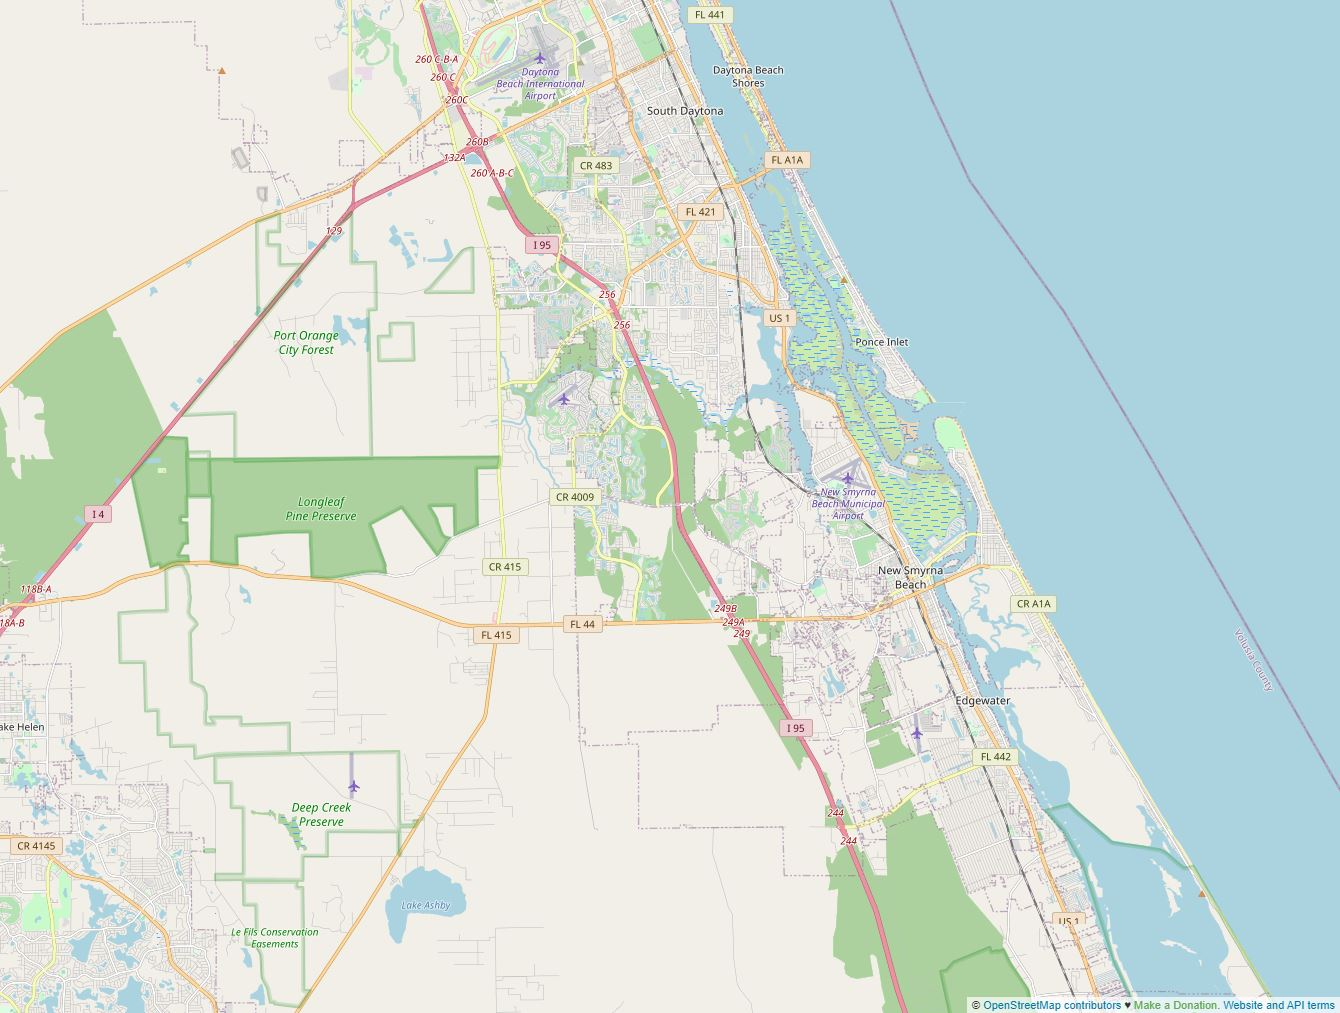 Spend your winter in New Smyrna Beach, Florida: Is New Smyrna Beach a good snowbird location? 4